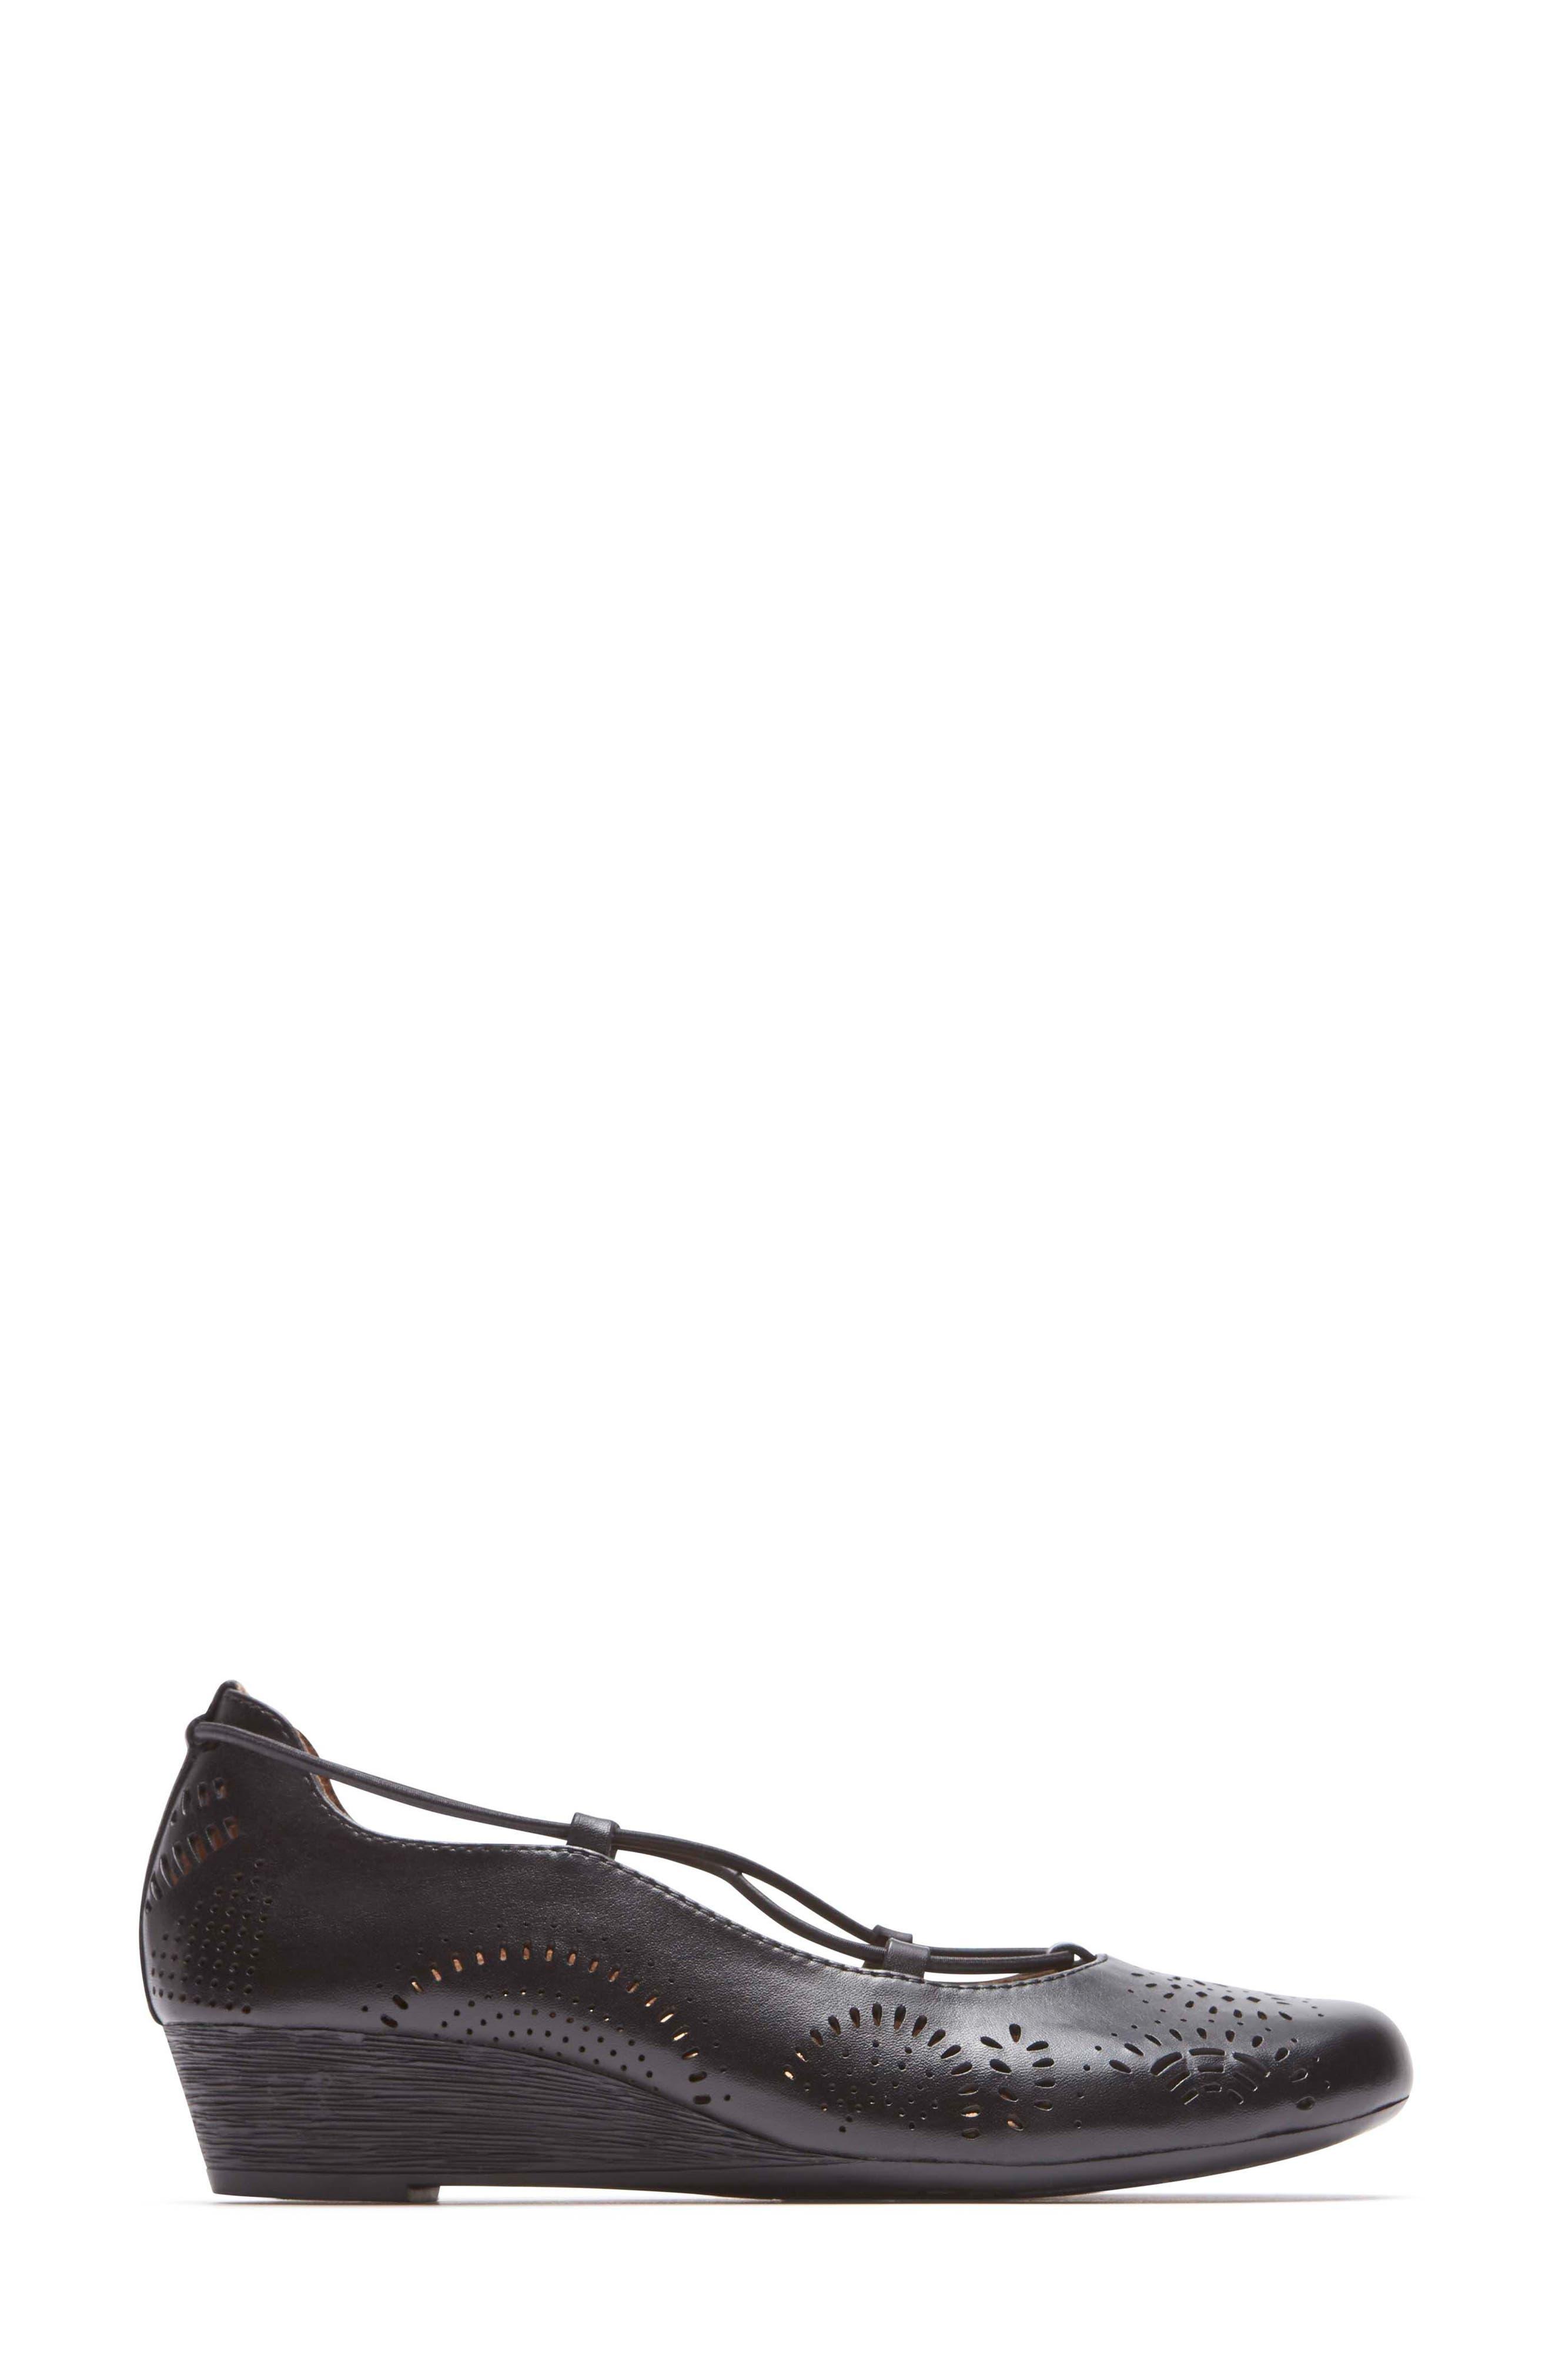 Janna Cross Strap Wedge Sandal,                             Alternate thumbnail 12, color,